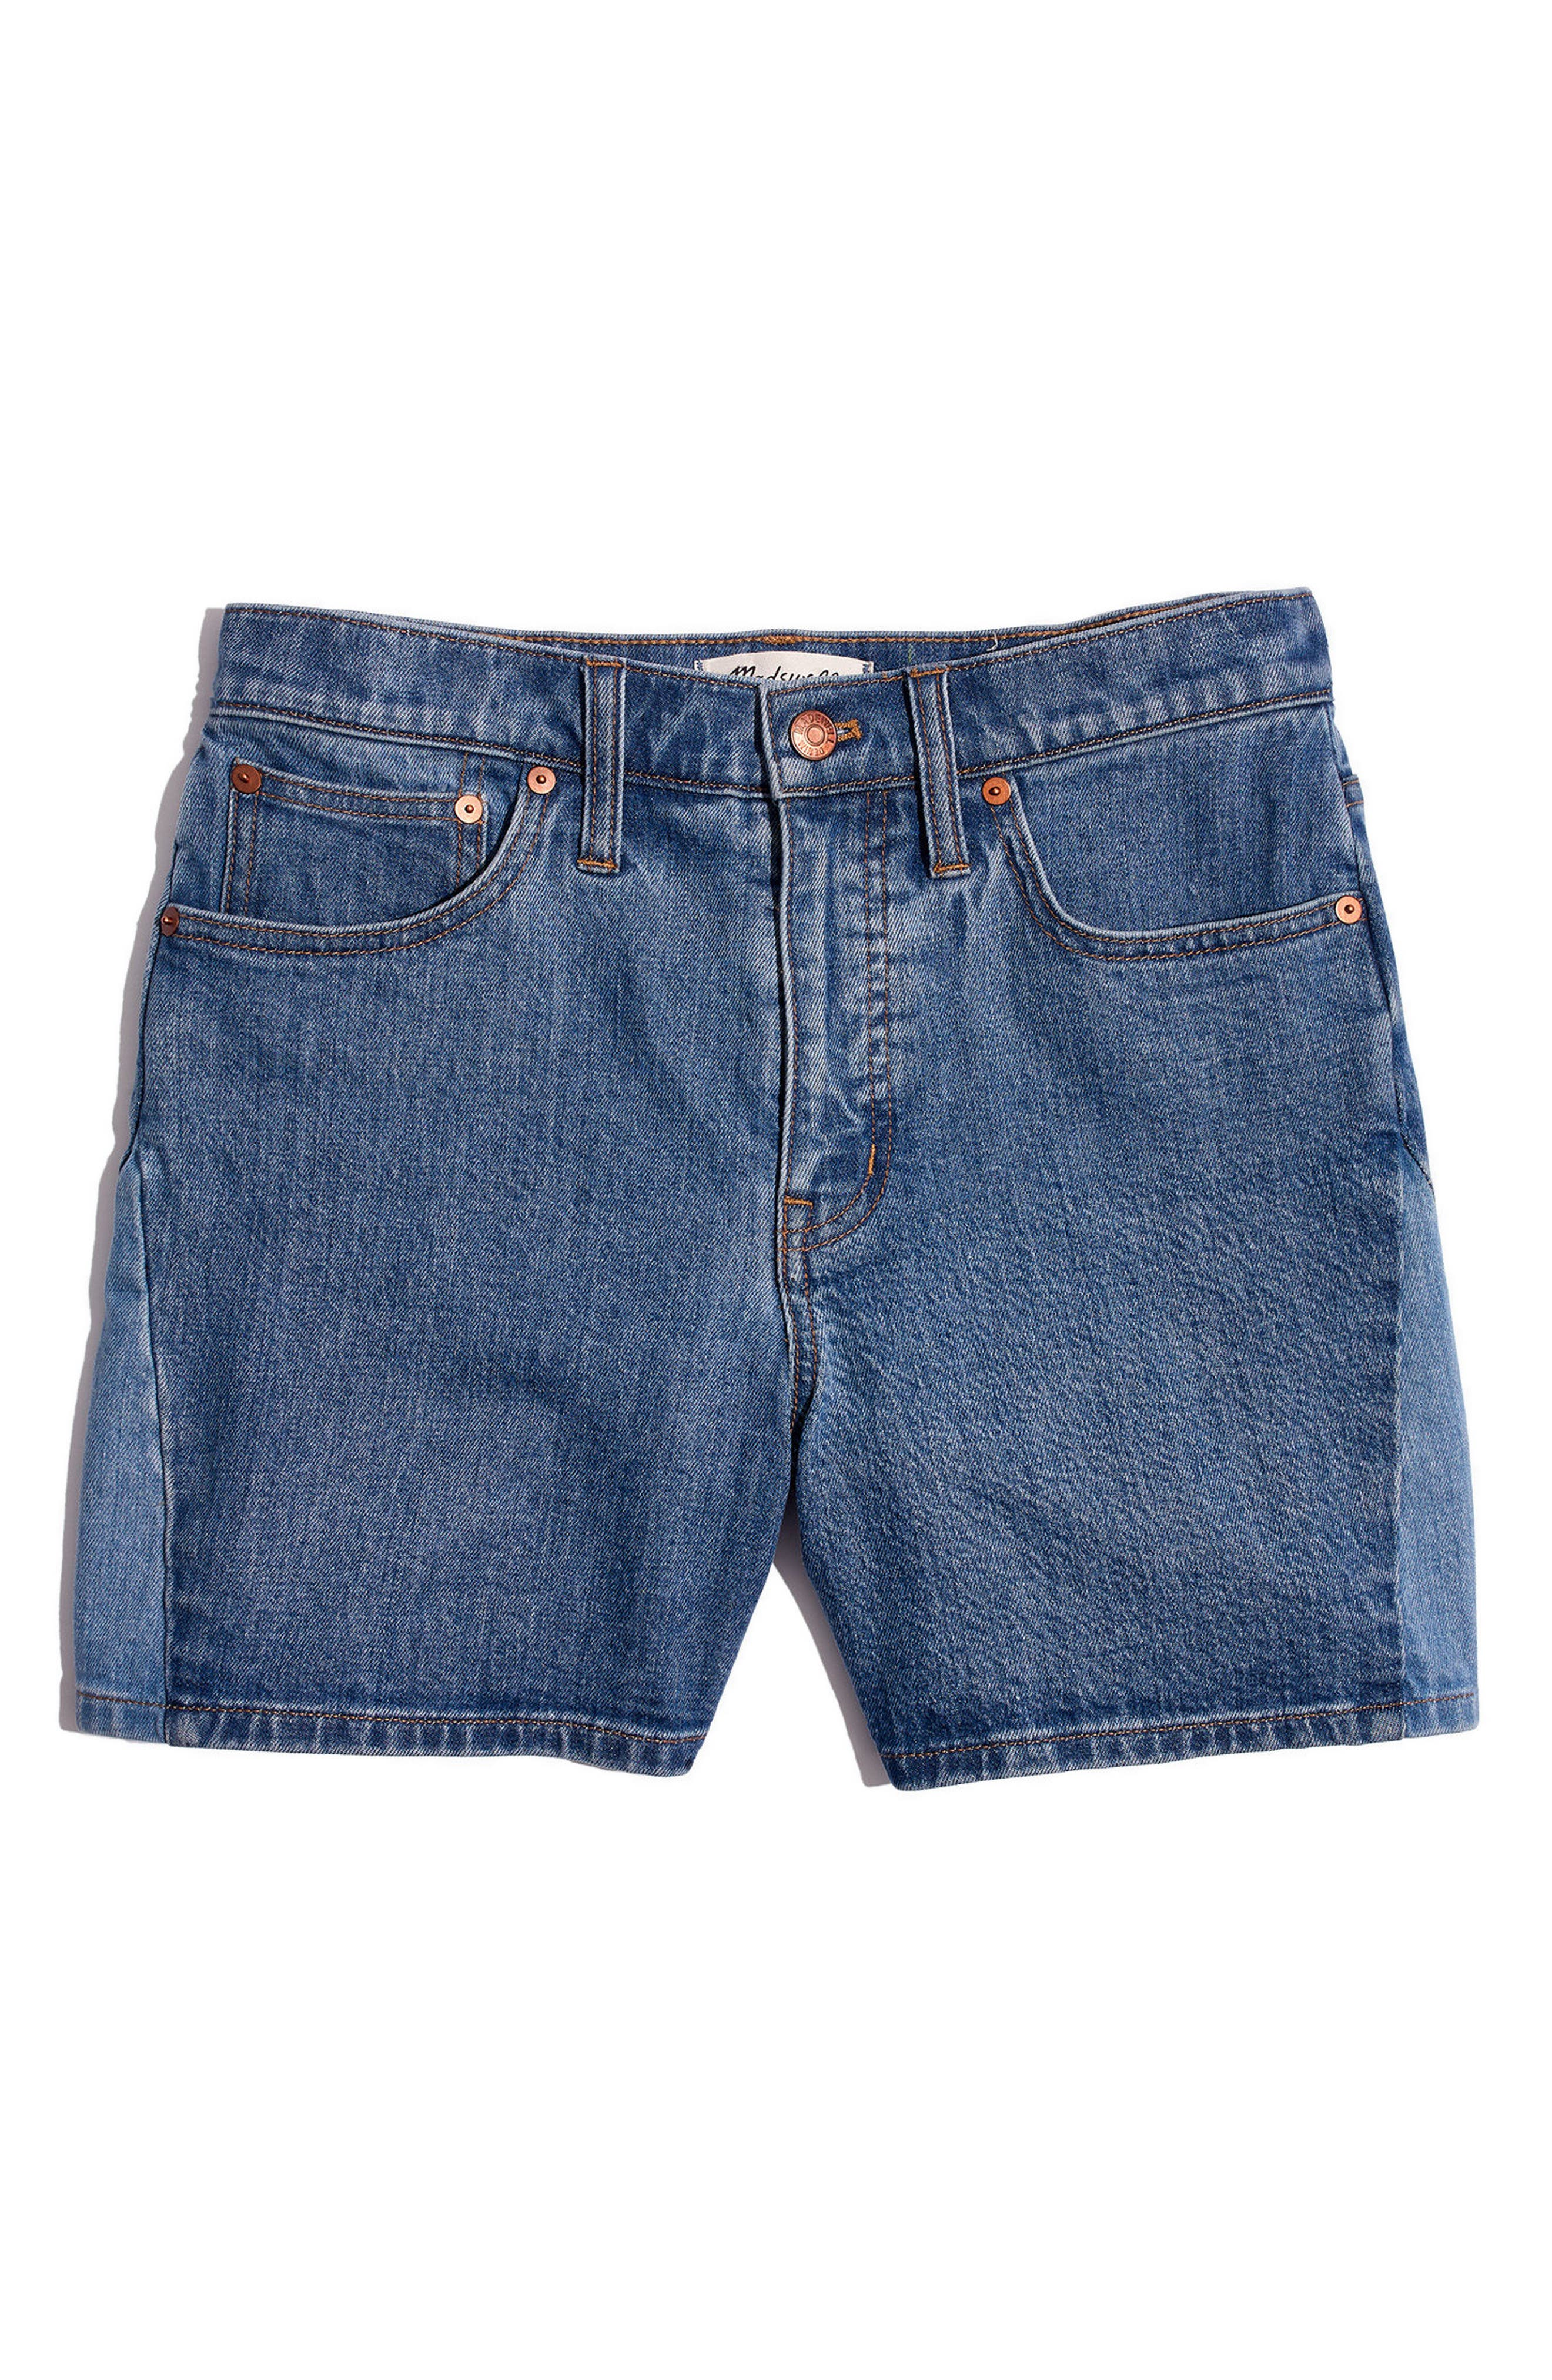 High Waist Pieced Denim Shorts,                             Alternate thumbnail 4, color,                             400